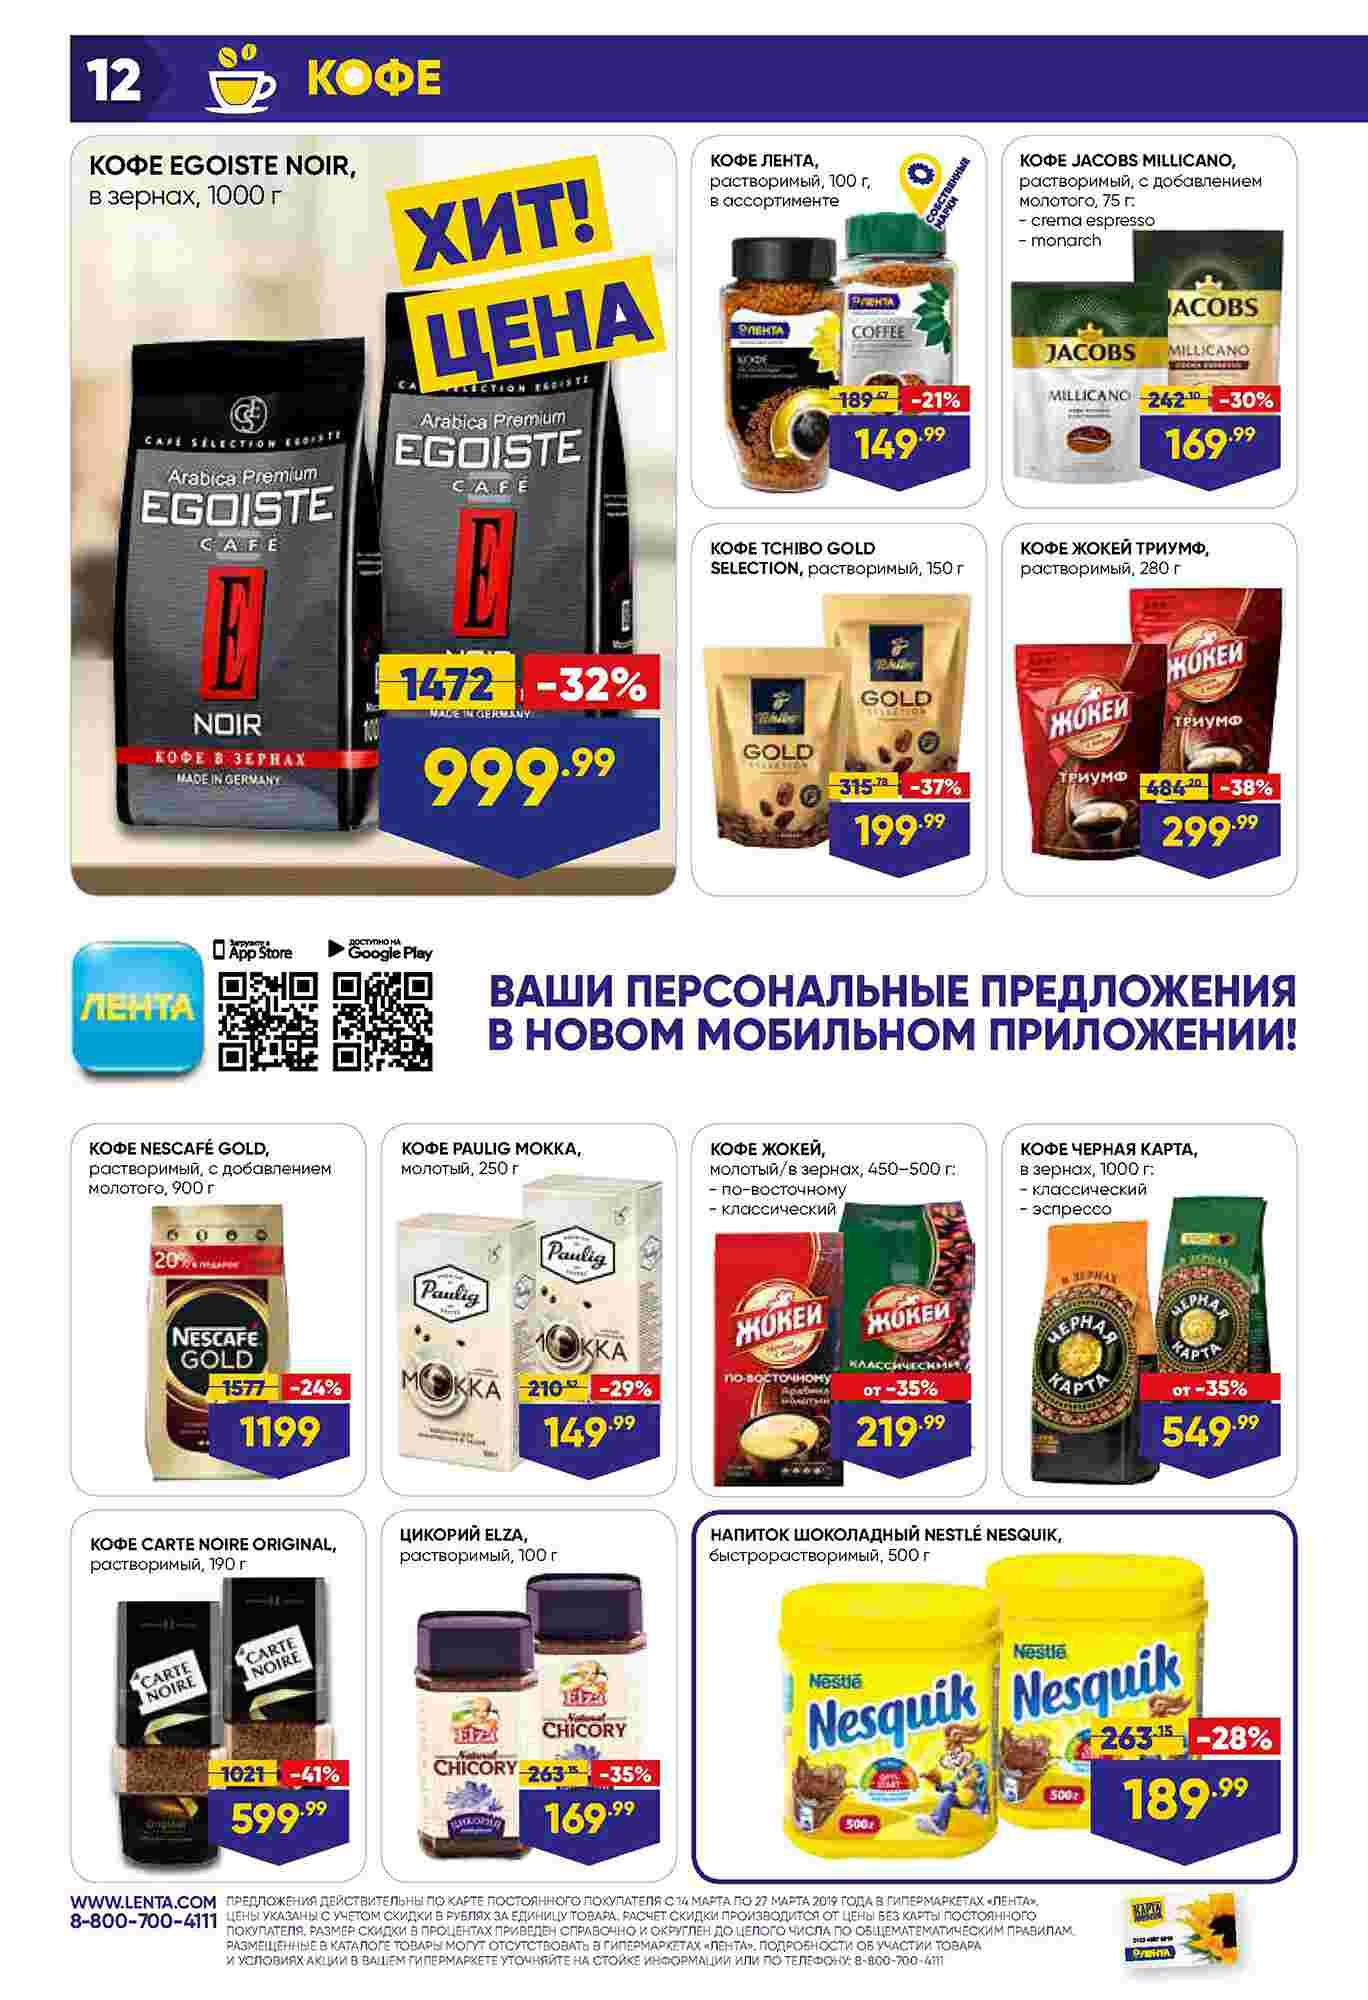 Каталог Лента гипермаркет 14-27.03.2019 стр. - 0001 - 0012